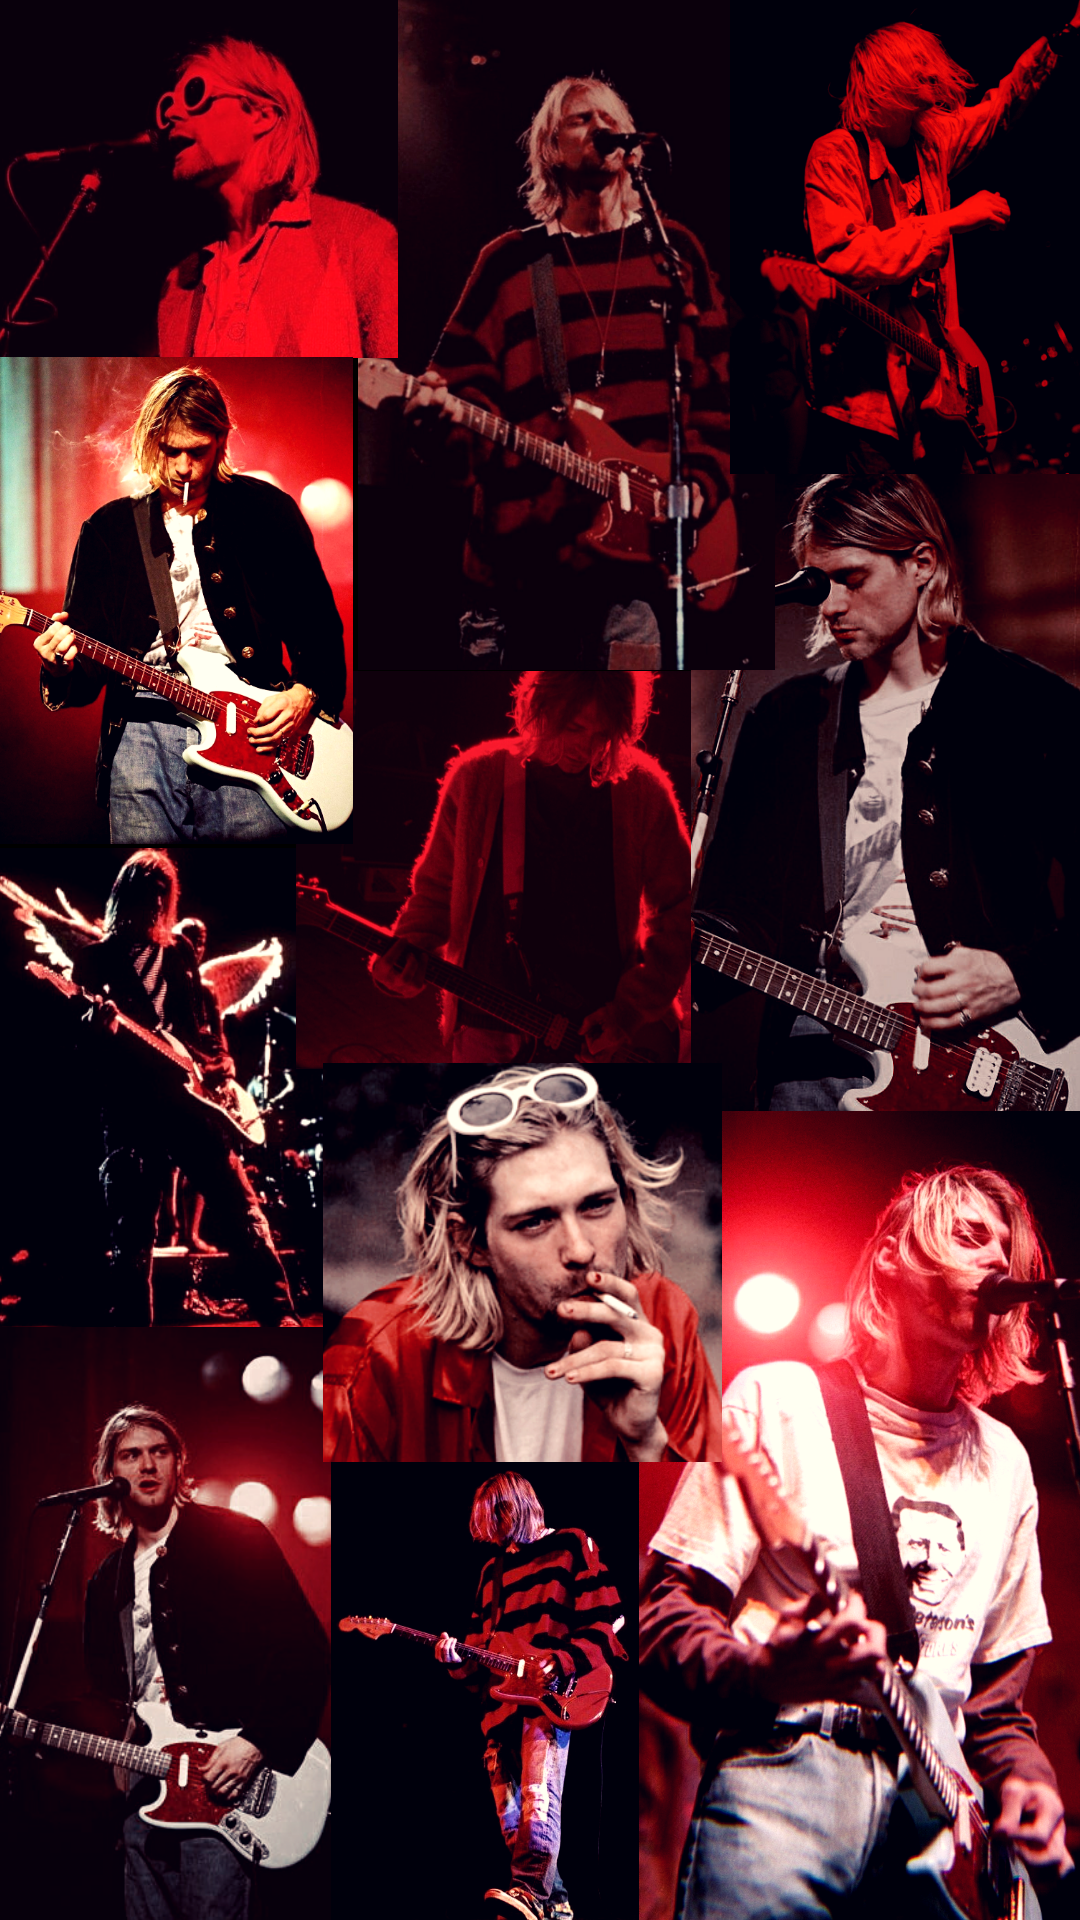 Rock Wallpaper S Nirvana Wallpaper Nirvana Lyrics Nirvana Kurt Cobain